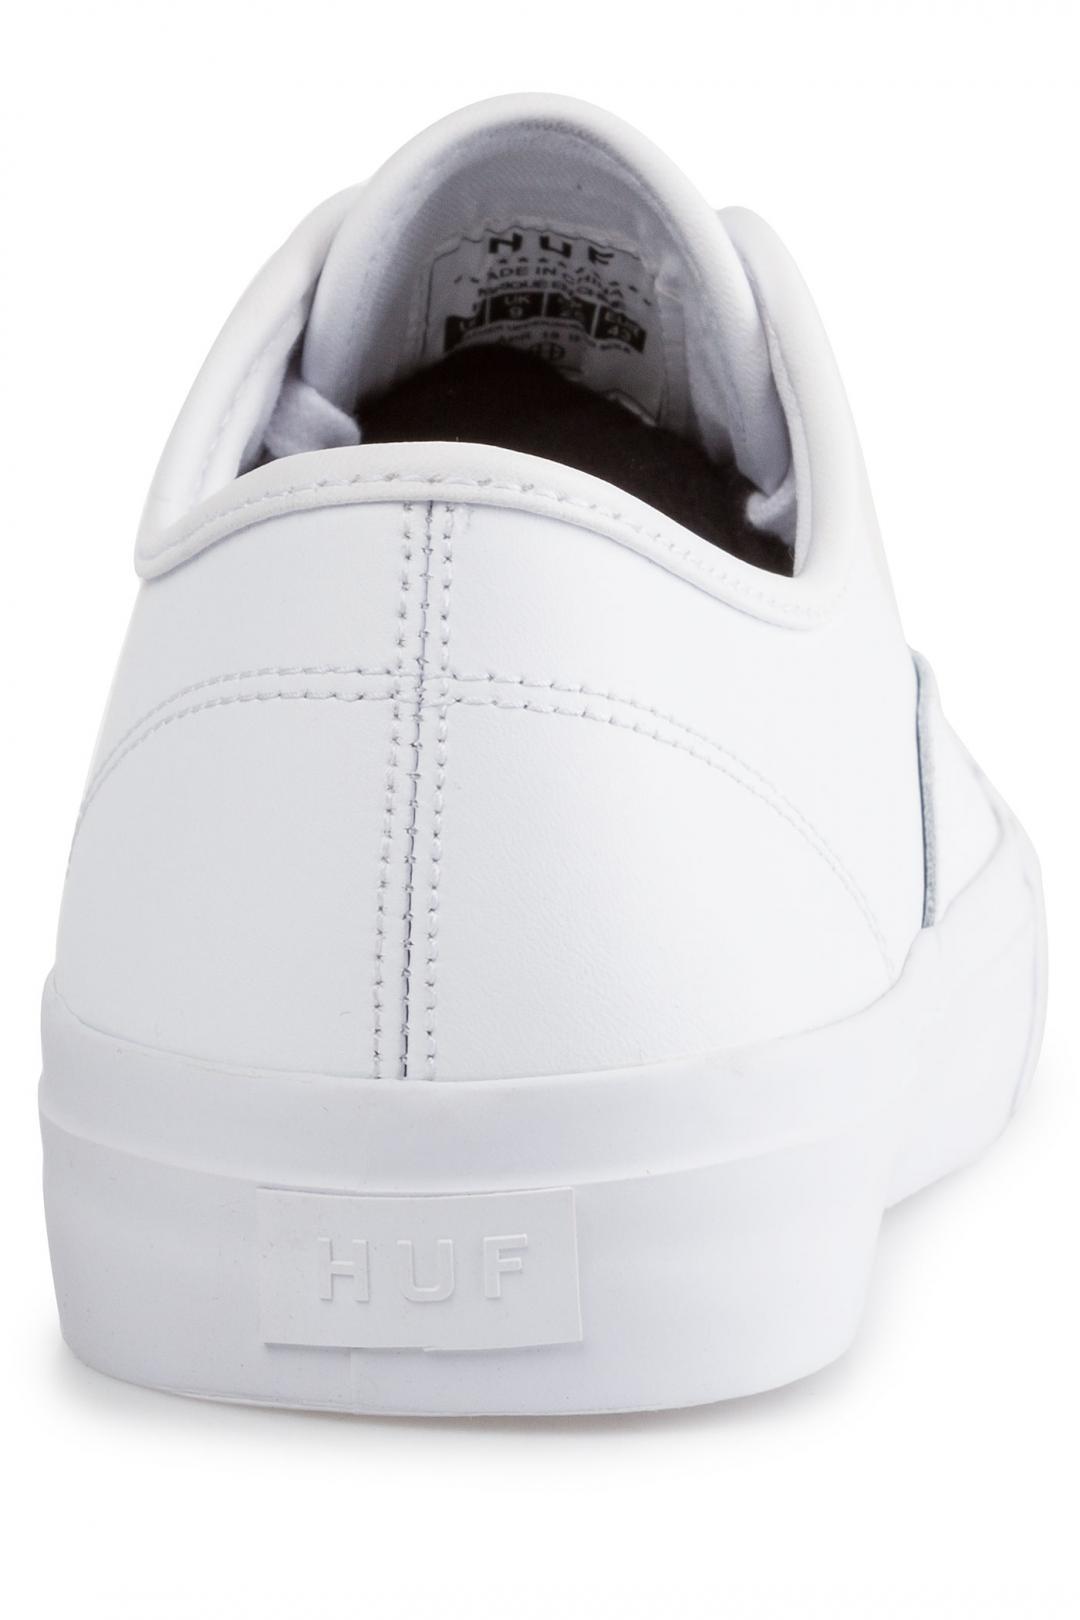 Uomo HUF Cromer white   Sneaker